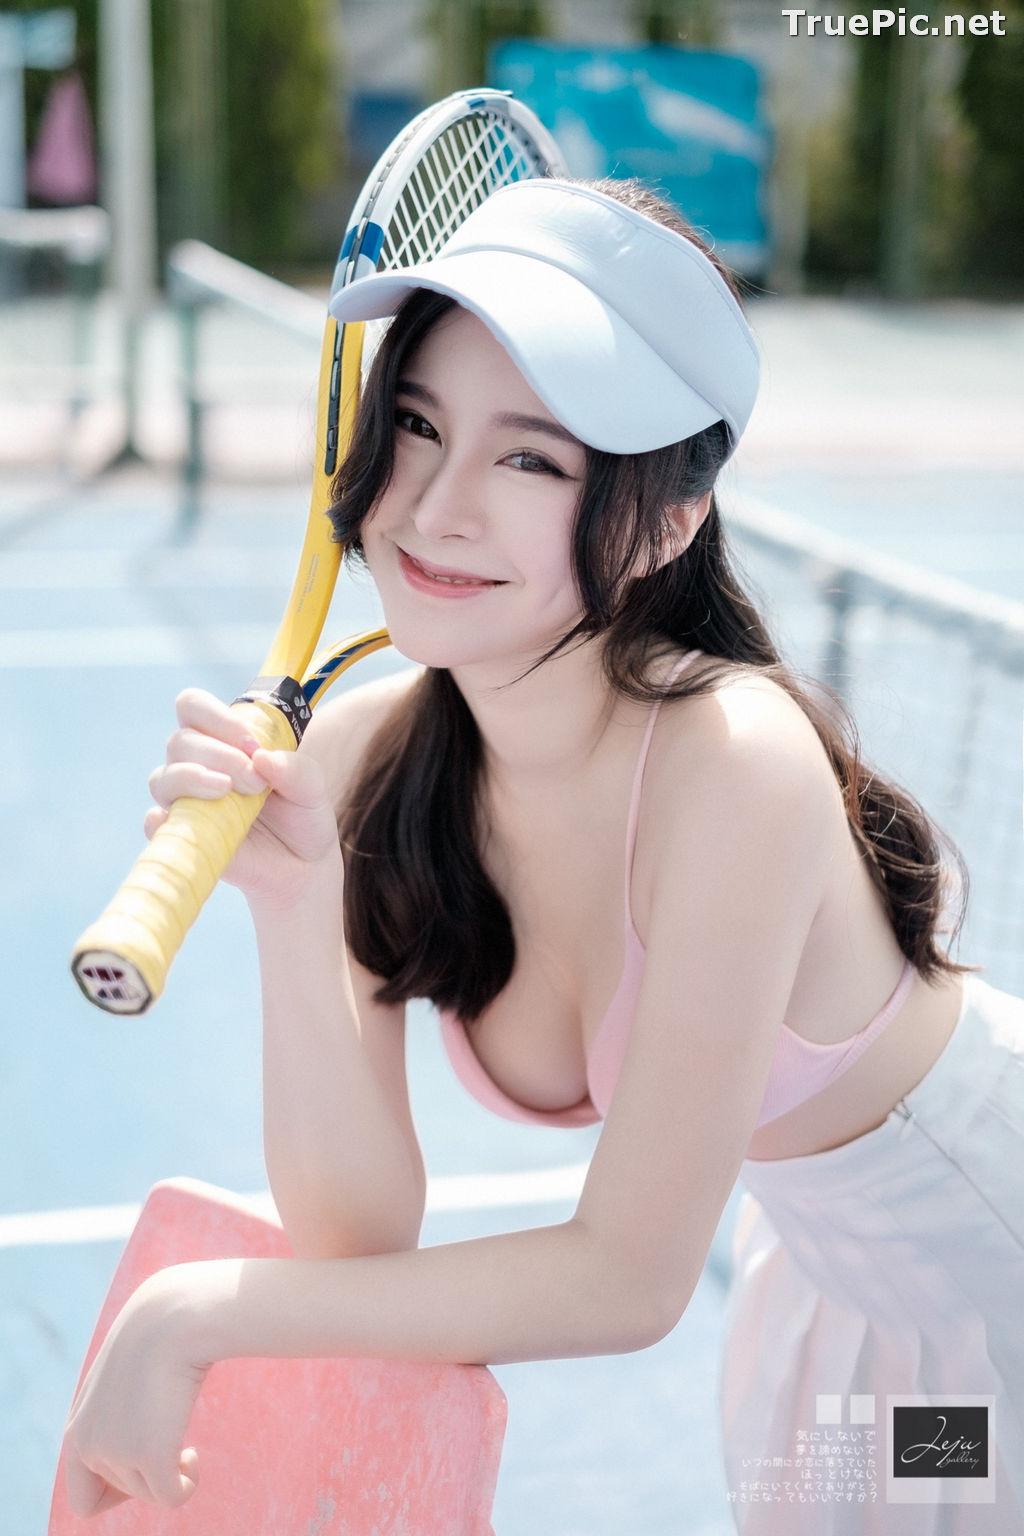 Image Thailand Model - Sarutaya Tawechaisupaphong - Hot Girl Tennis - TruePic.net - Picture-1